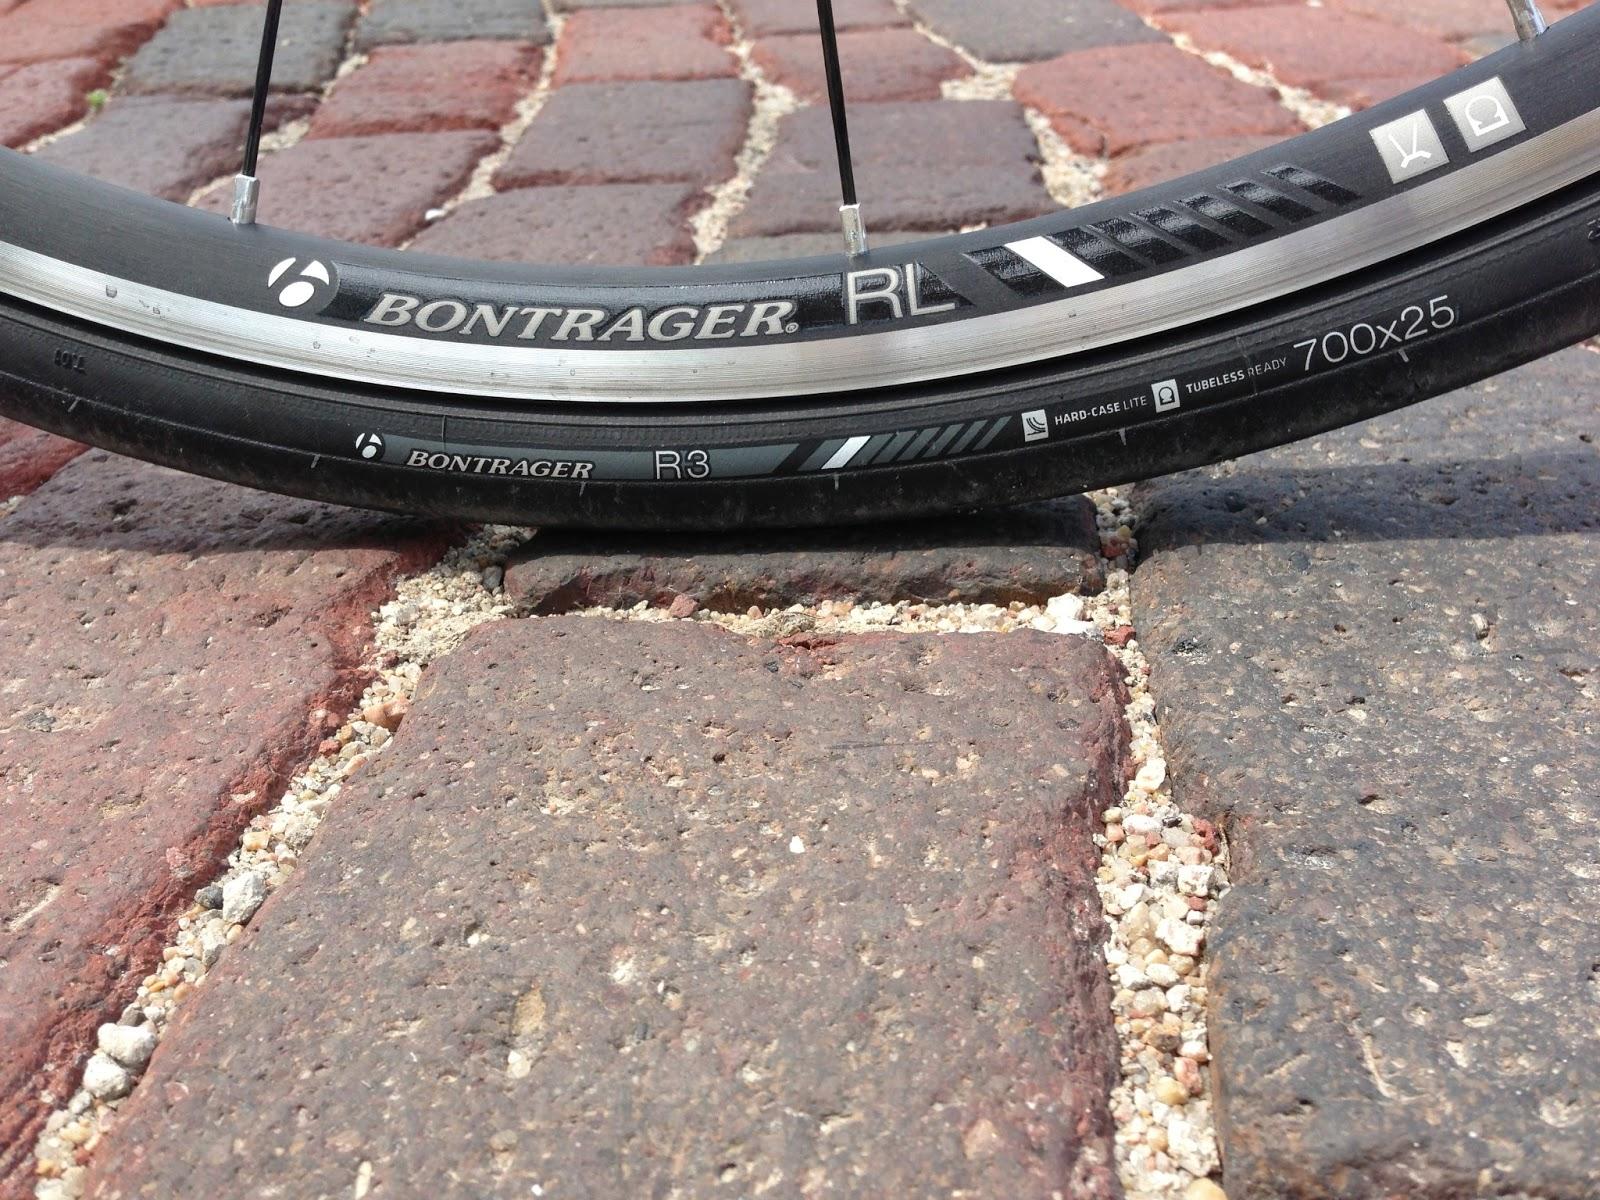 Review Bontrager Race Lite Tlr Wheelset R3 Tubeless Tires